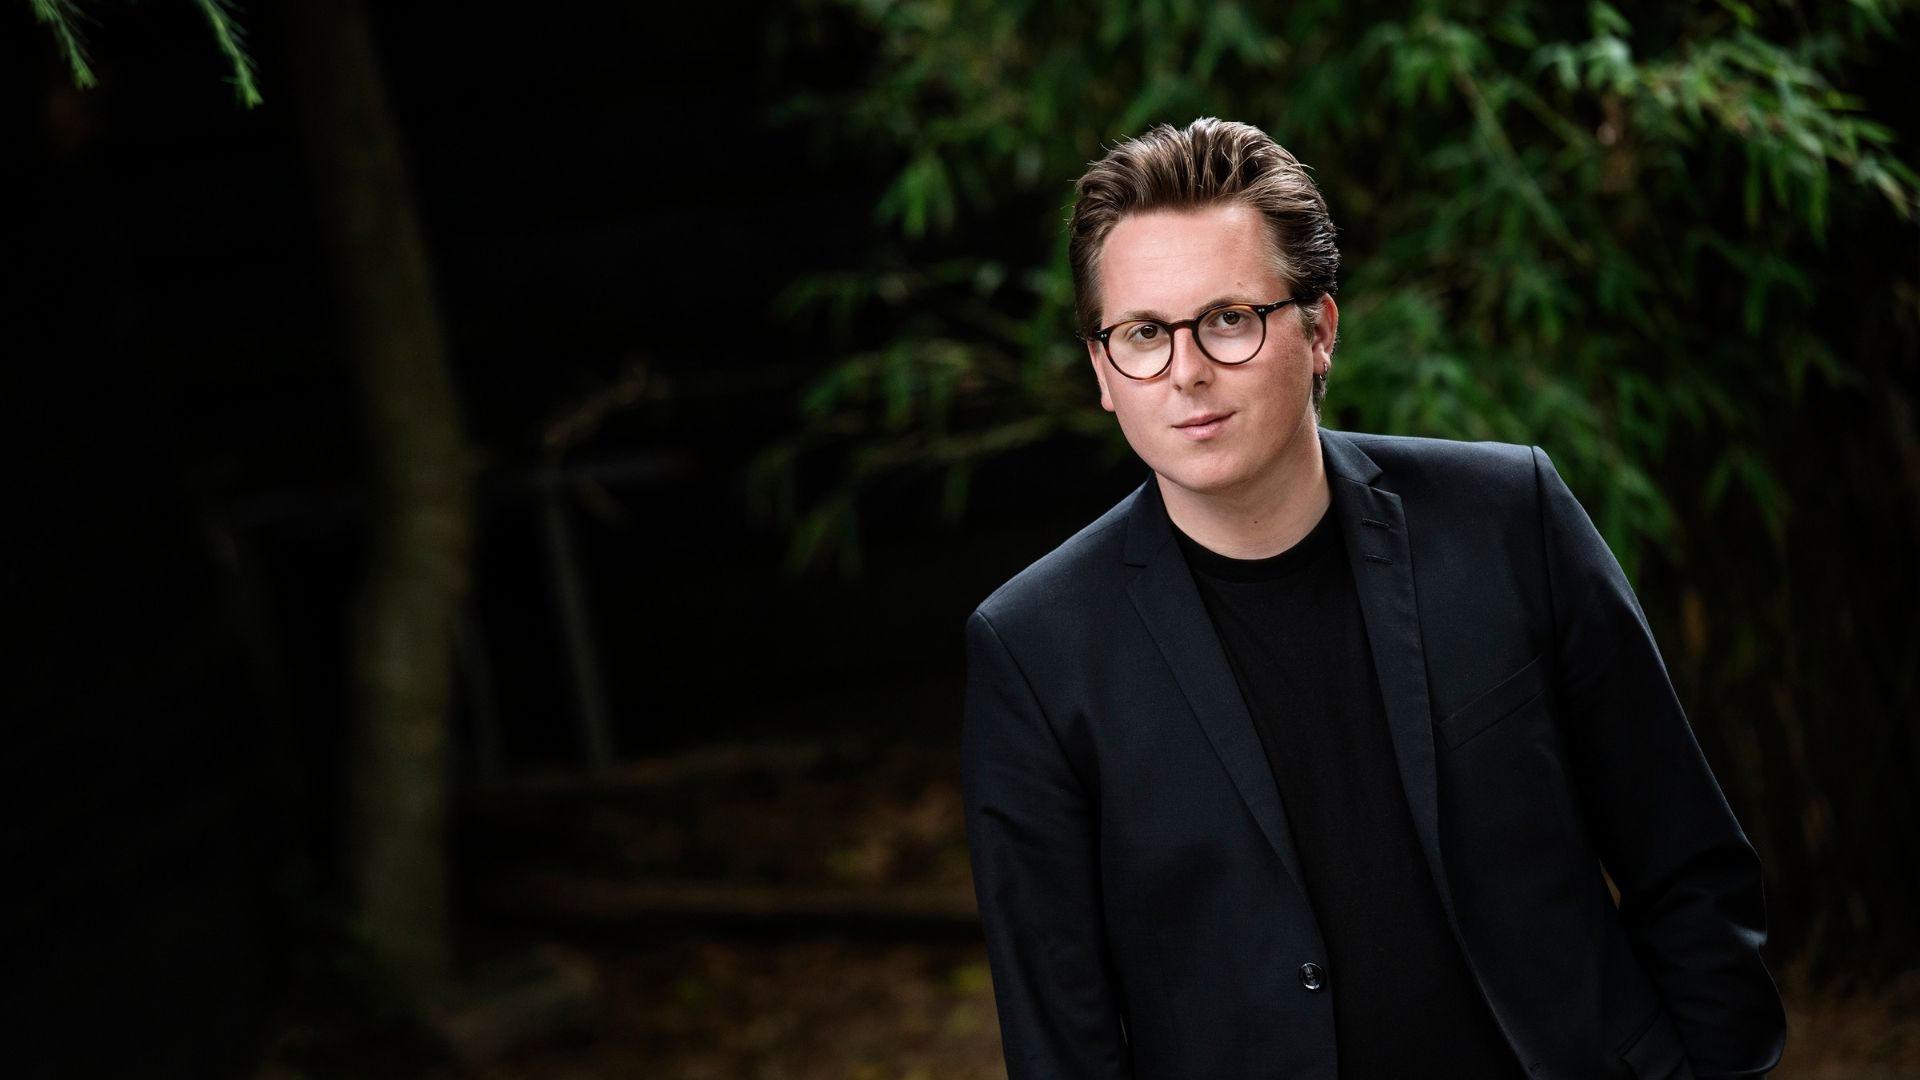 Thomas Korsgaard